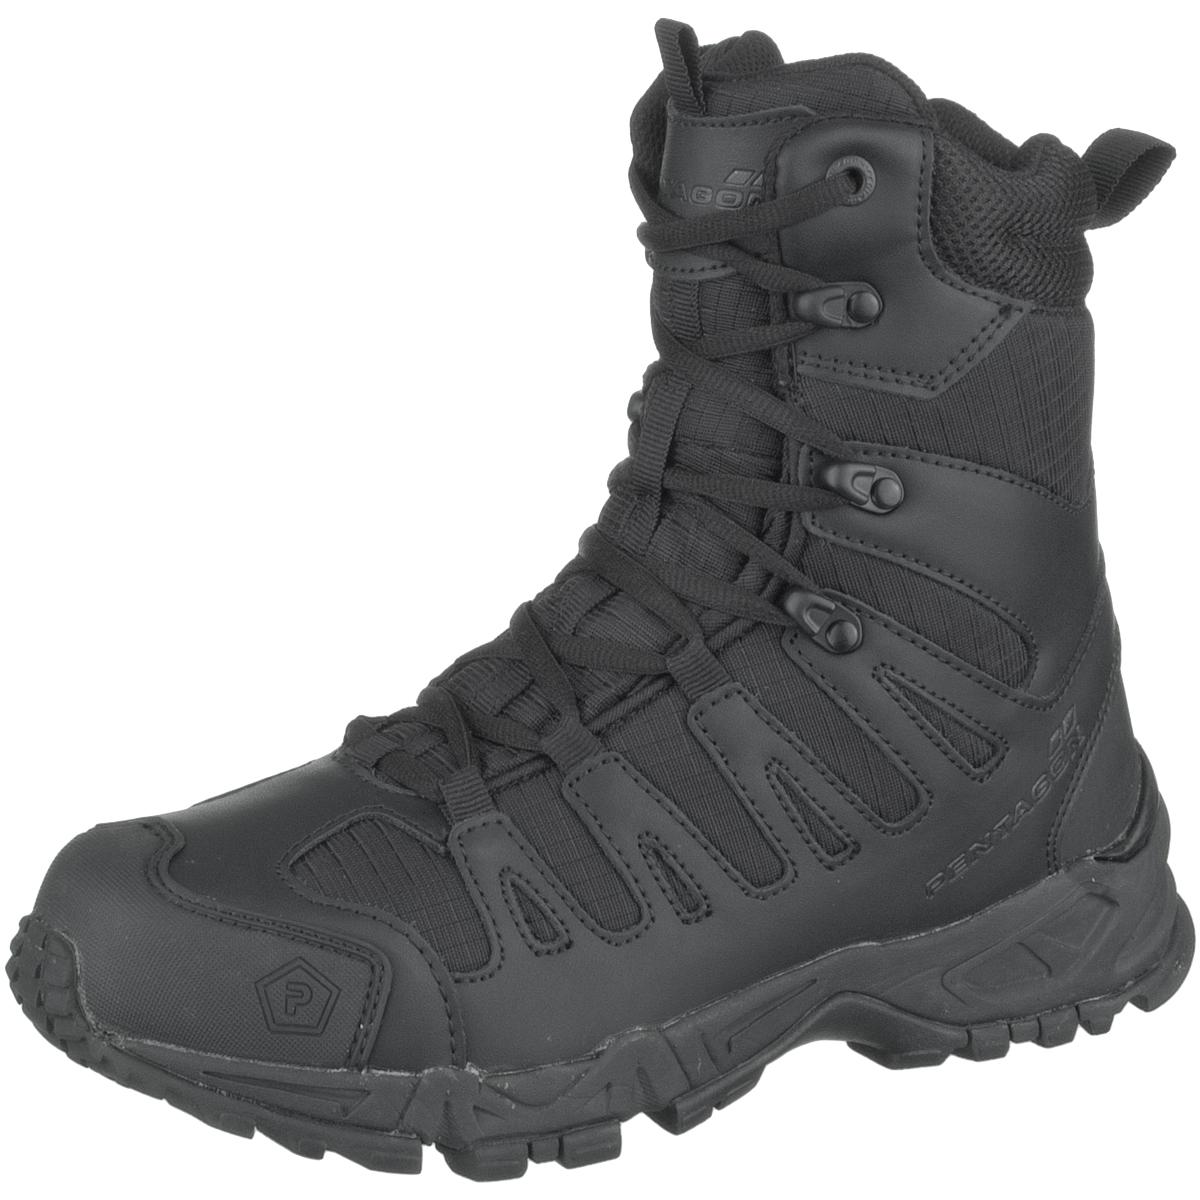 pentagon achilles 8 quot tactical boots dintex black boots